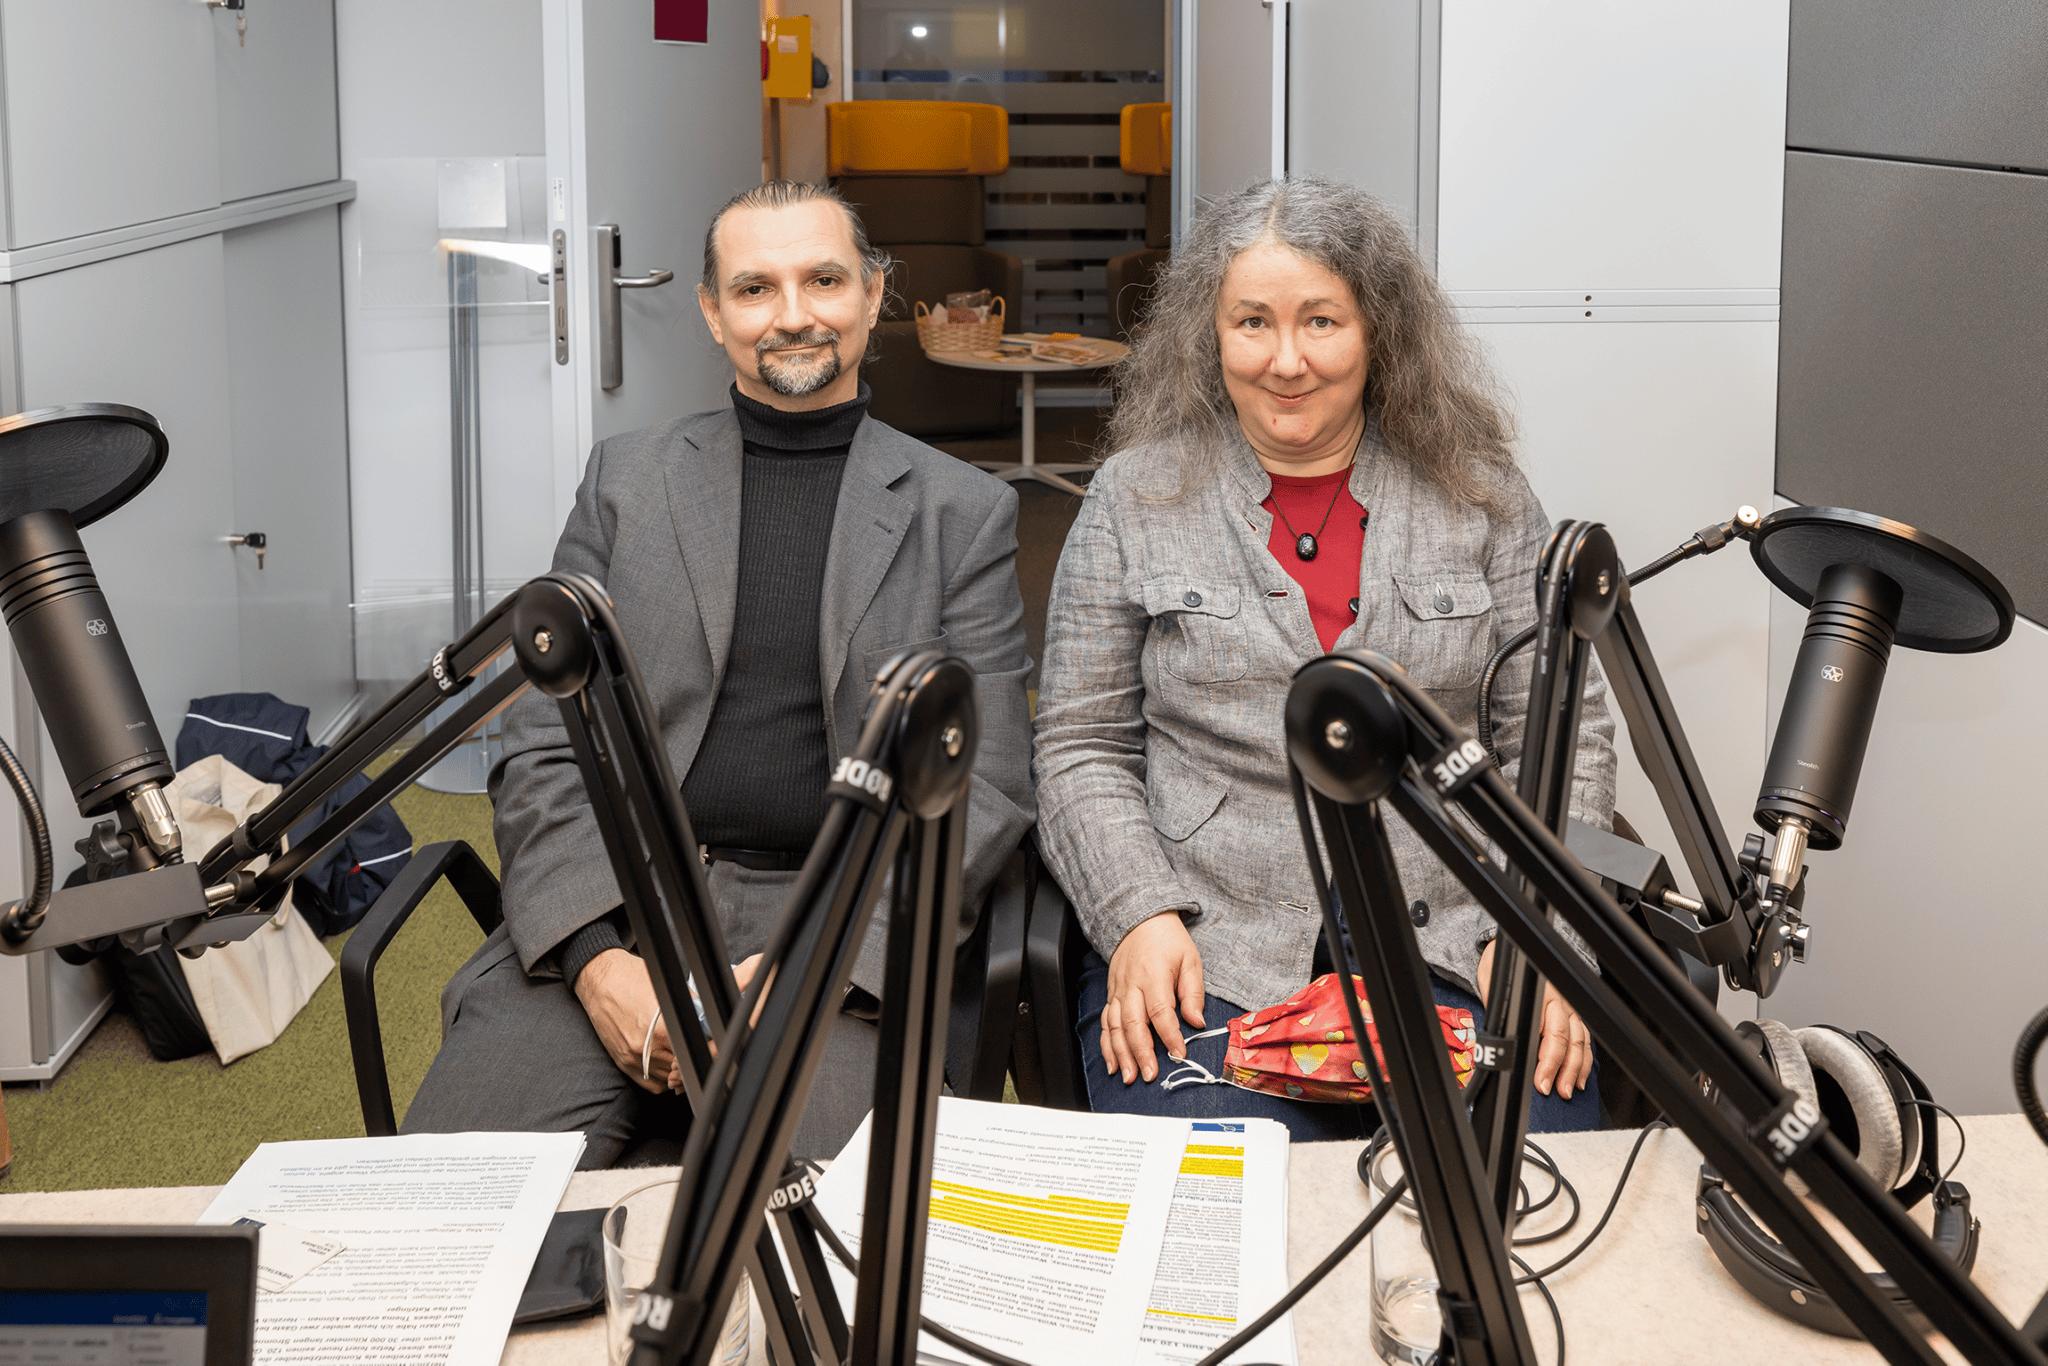 Ilse und Georg Katzlinger im Podcast-Studio